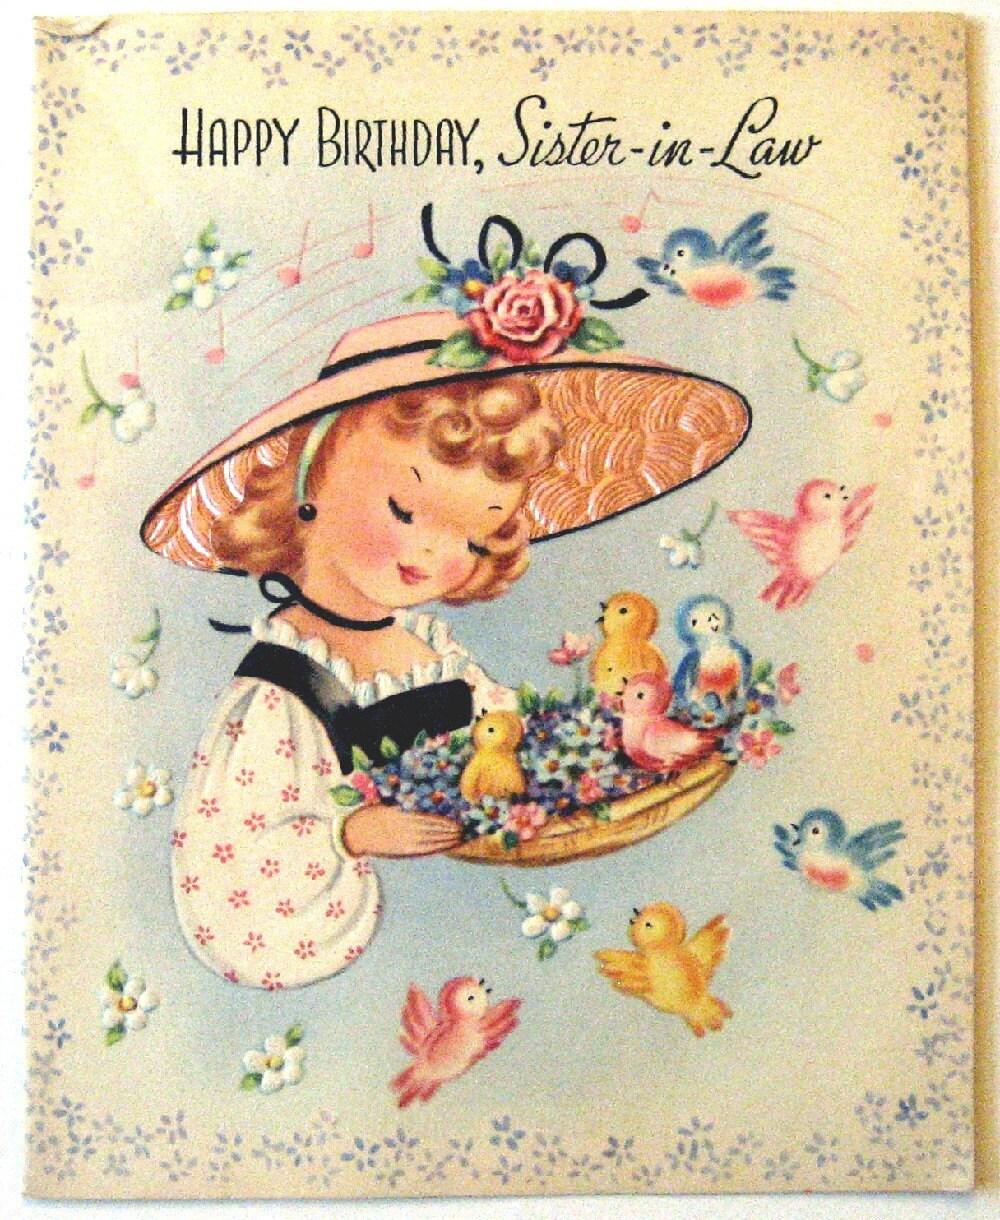 Vintage Birthday Card Happy Birthday Sister-in-Law